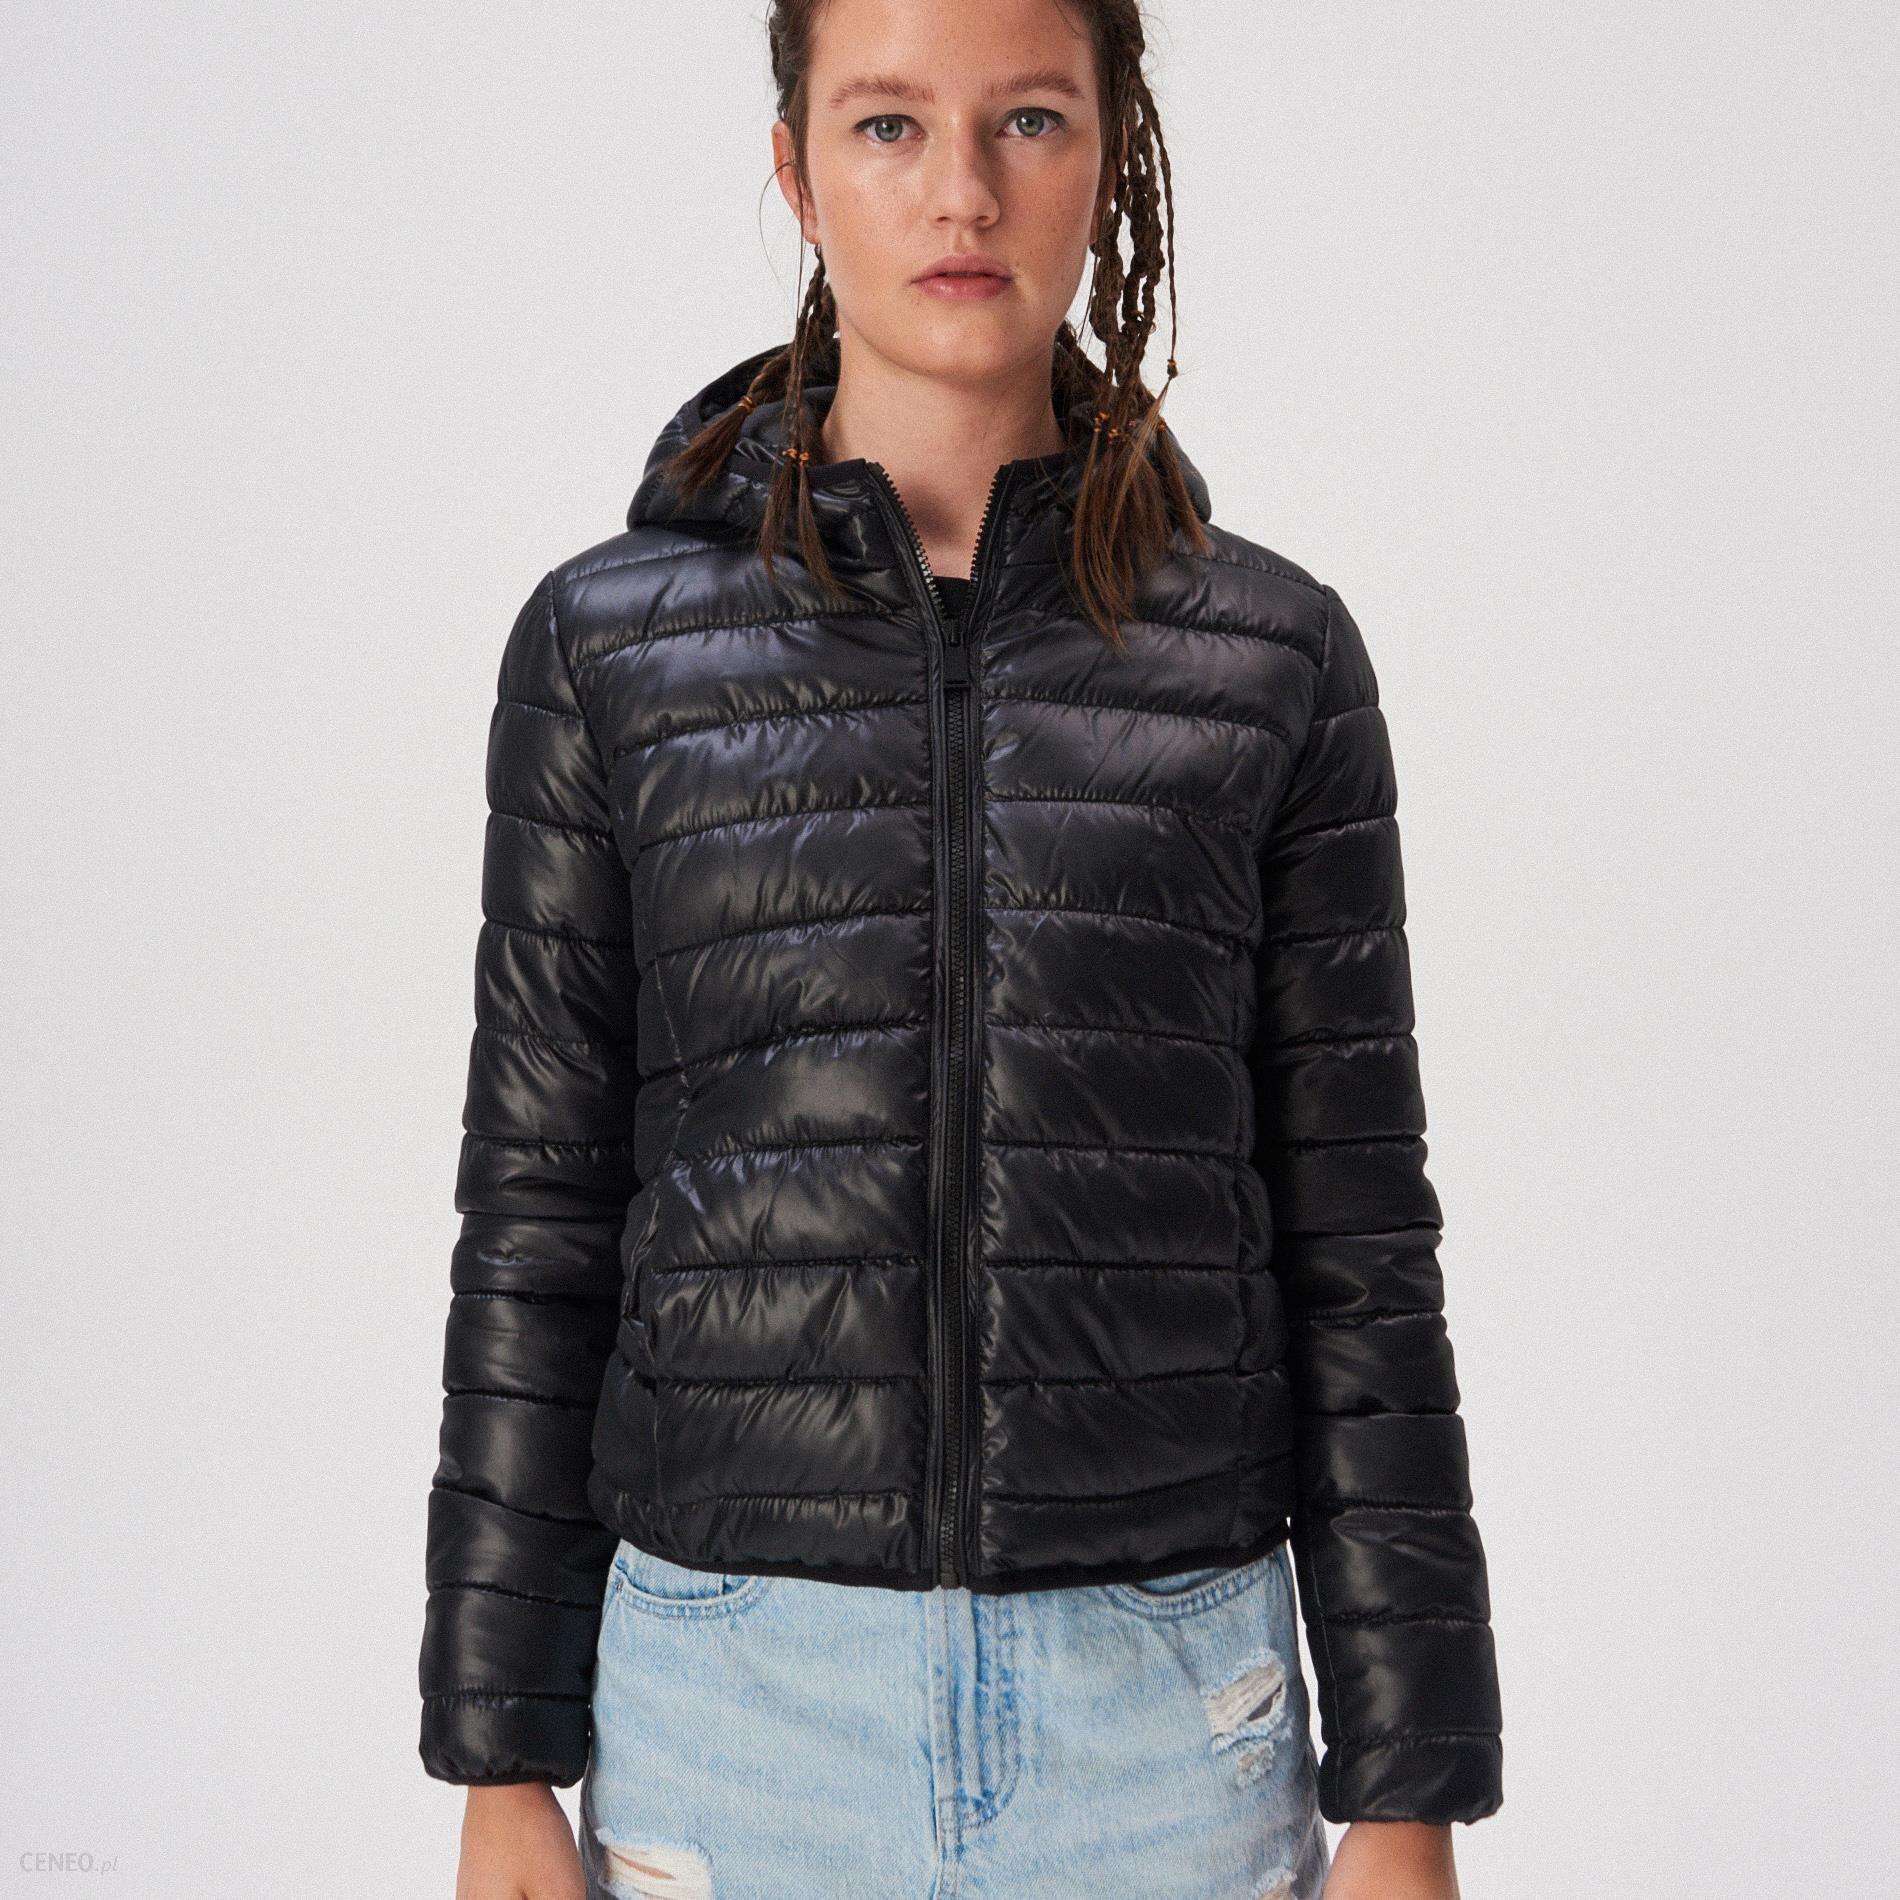 kurtka kapturem damskie kurtki adidas, porównaj ceny i kup